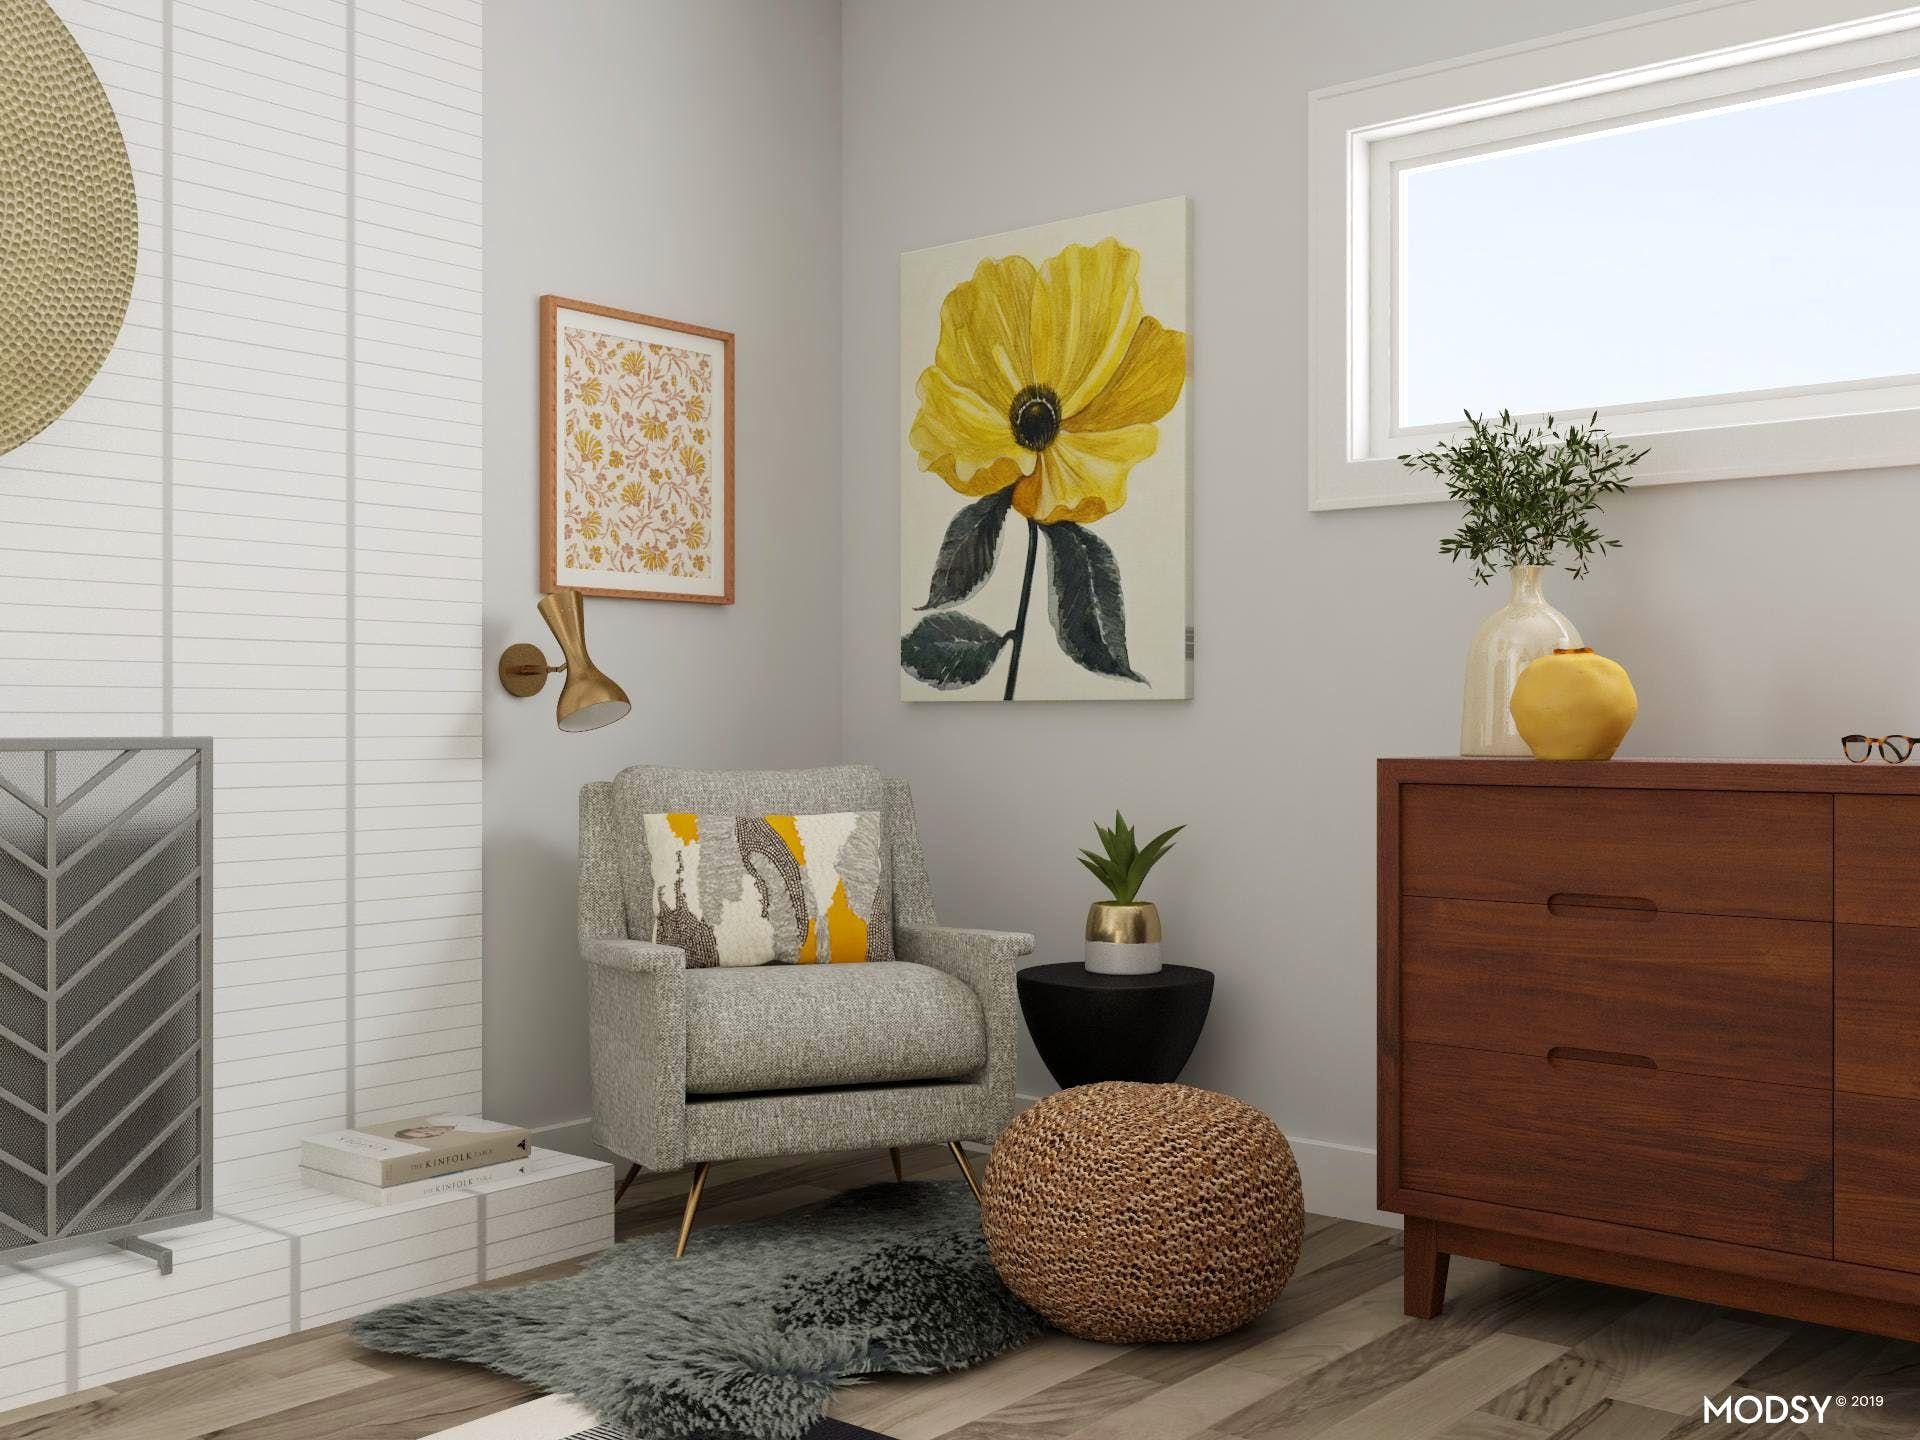 Best Pin By Lourdes Delacruz On Living Room In 2020 Modern 400 x 300